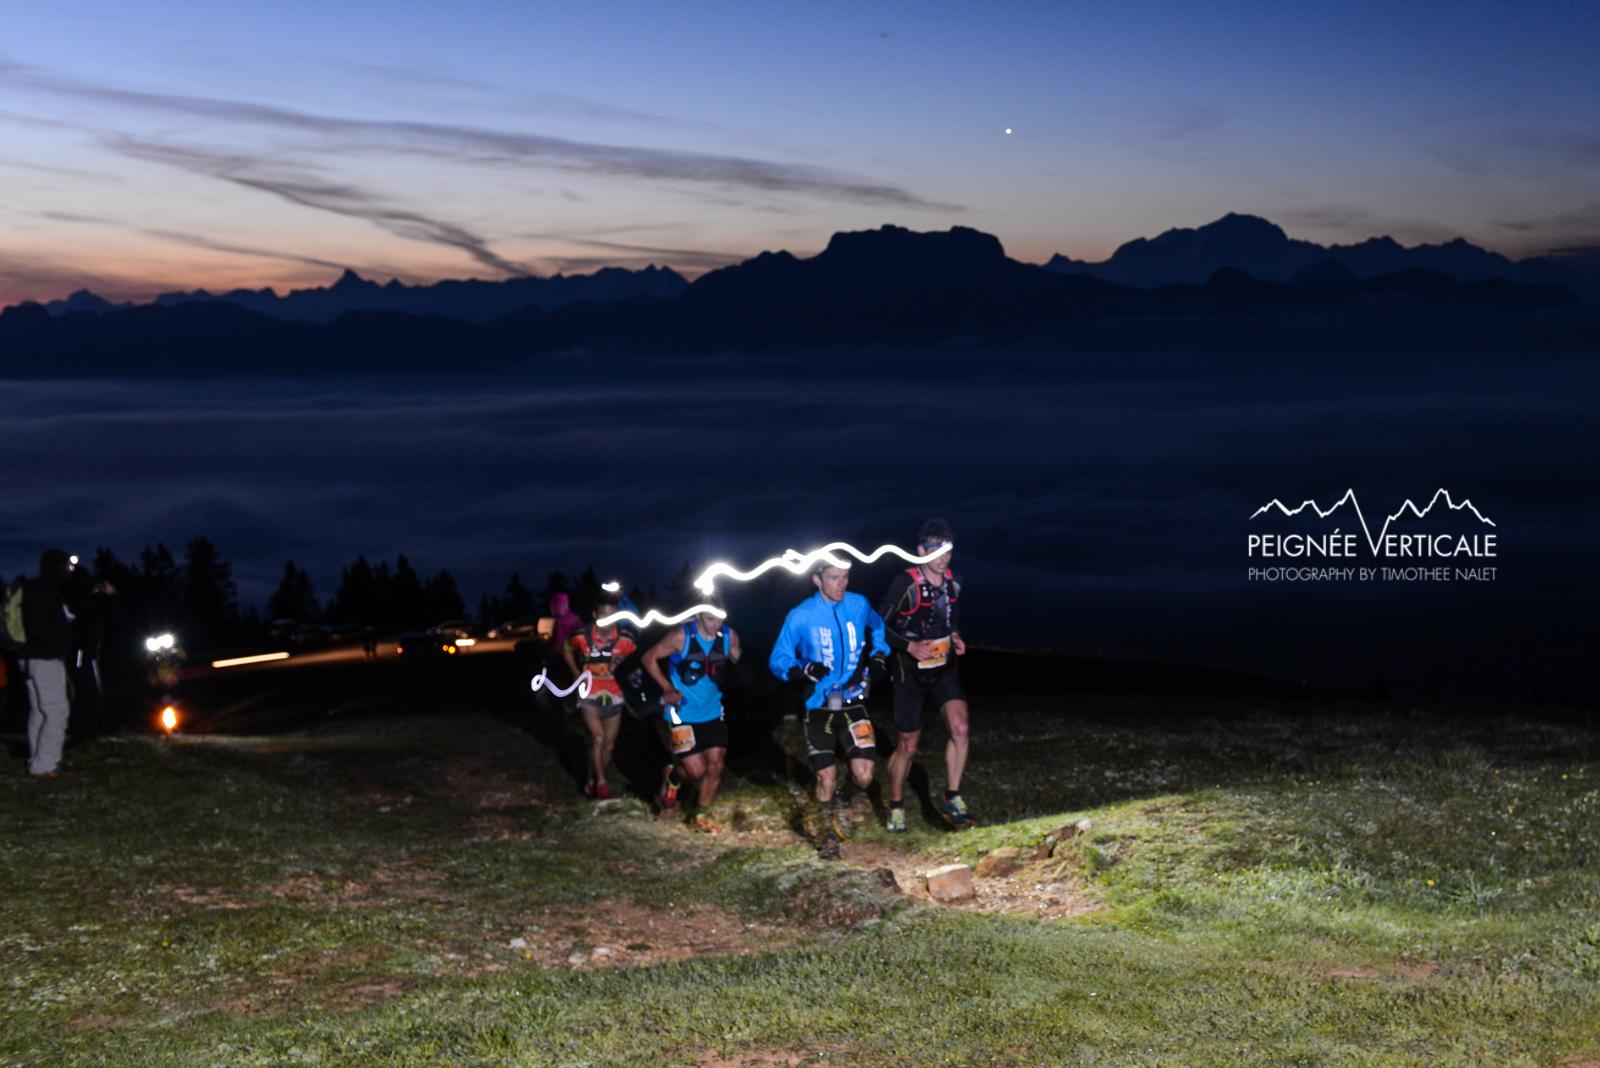 MaxiRace-Annecy-2014-Team-Hoka-Timothee-Nalet-0680.jpg